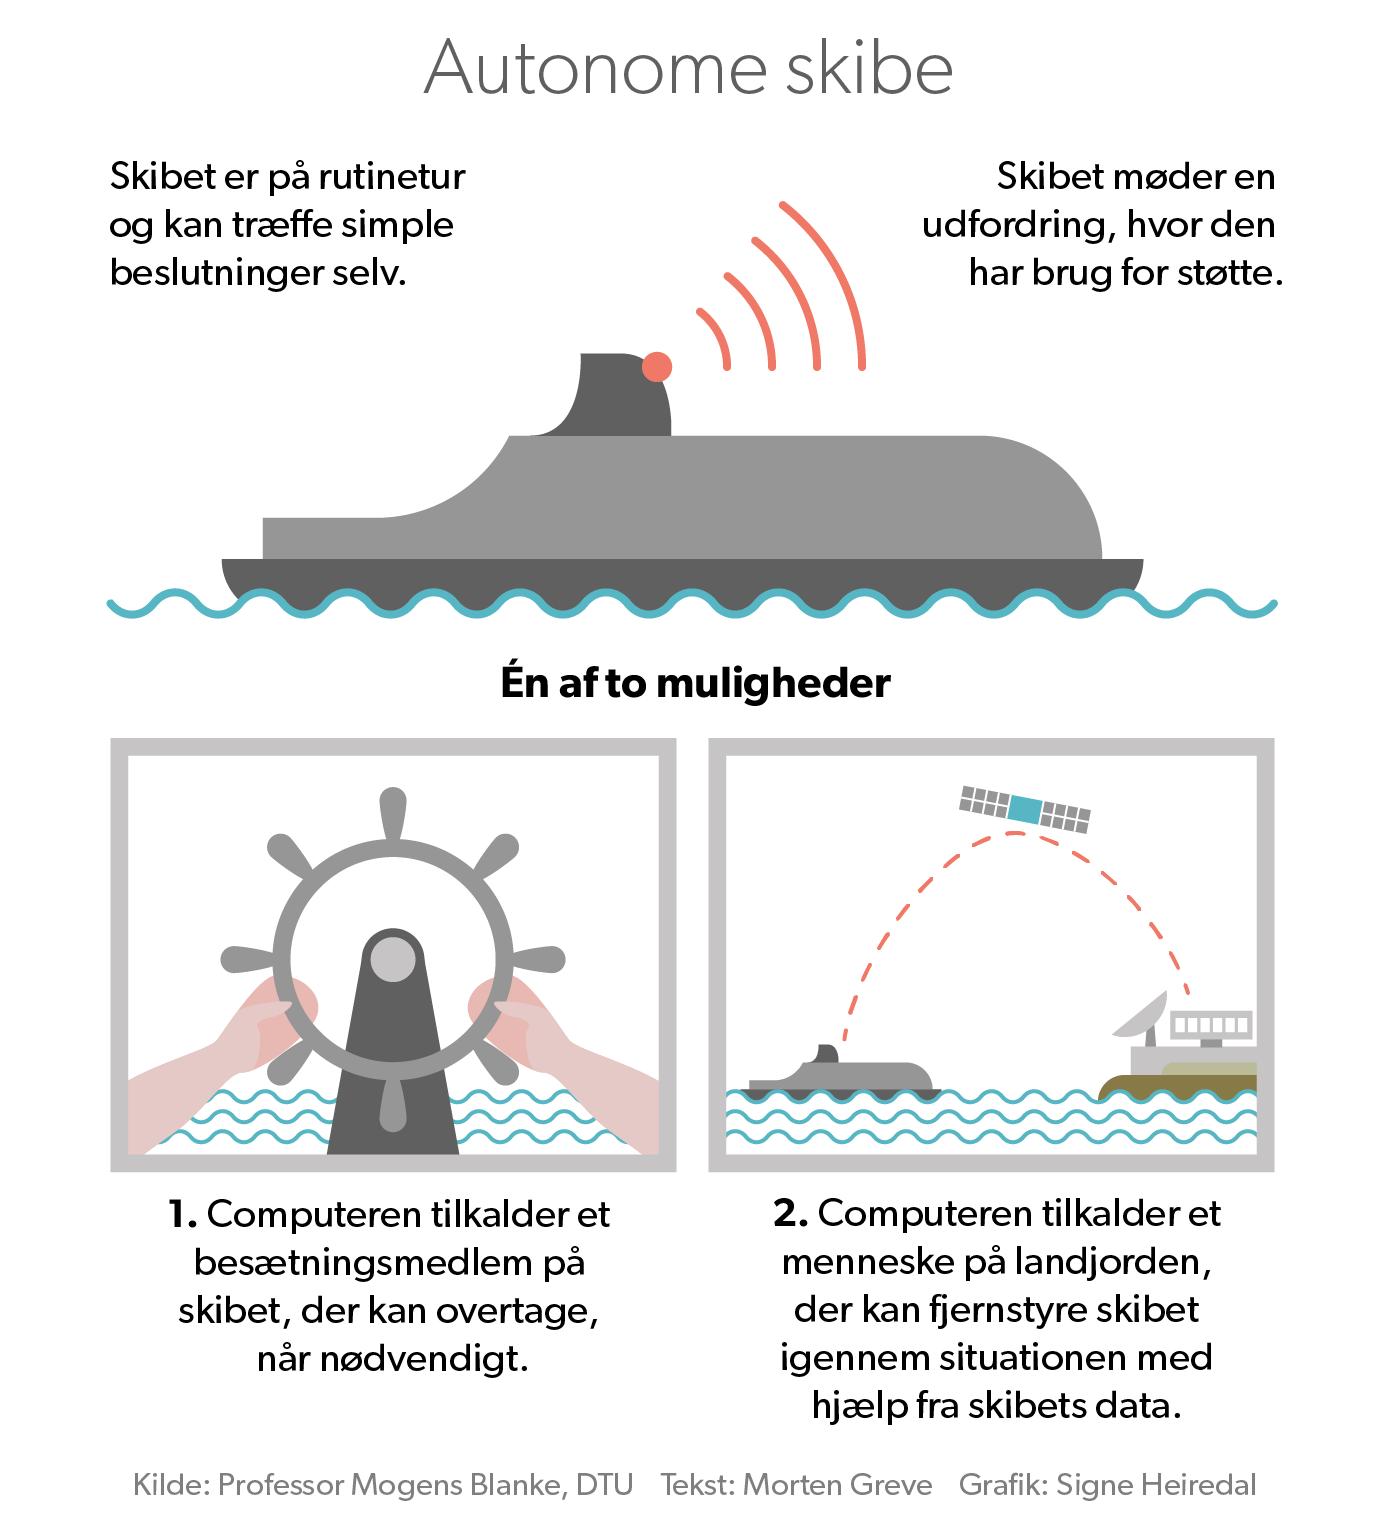 autonome_skibe_694.png